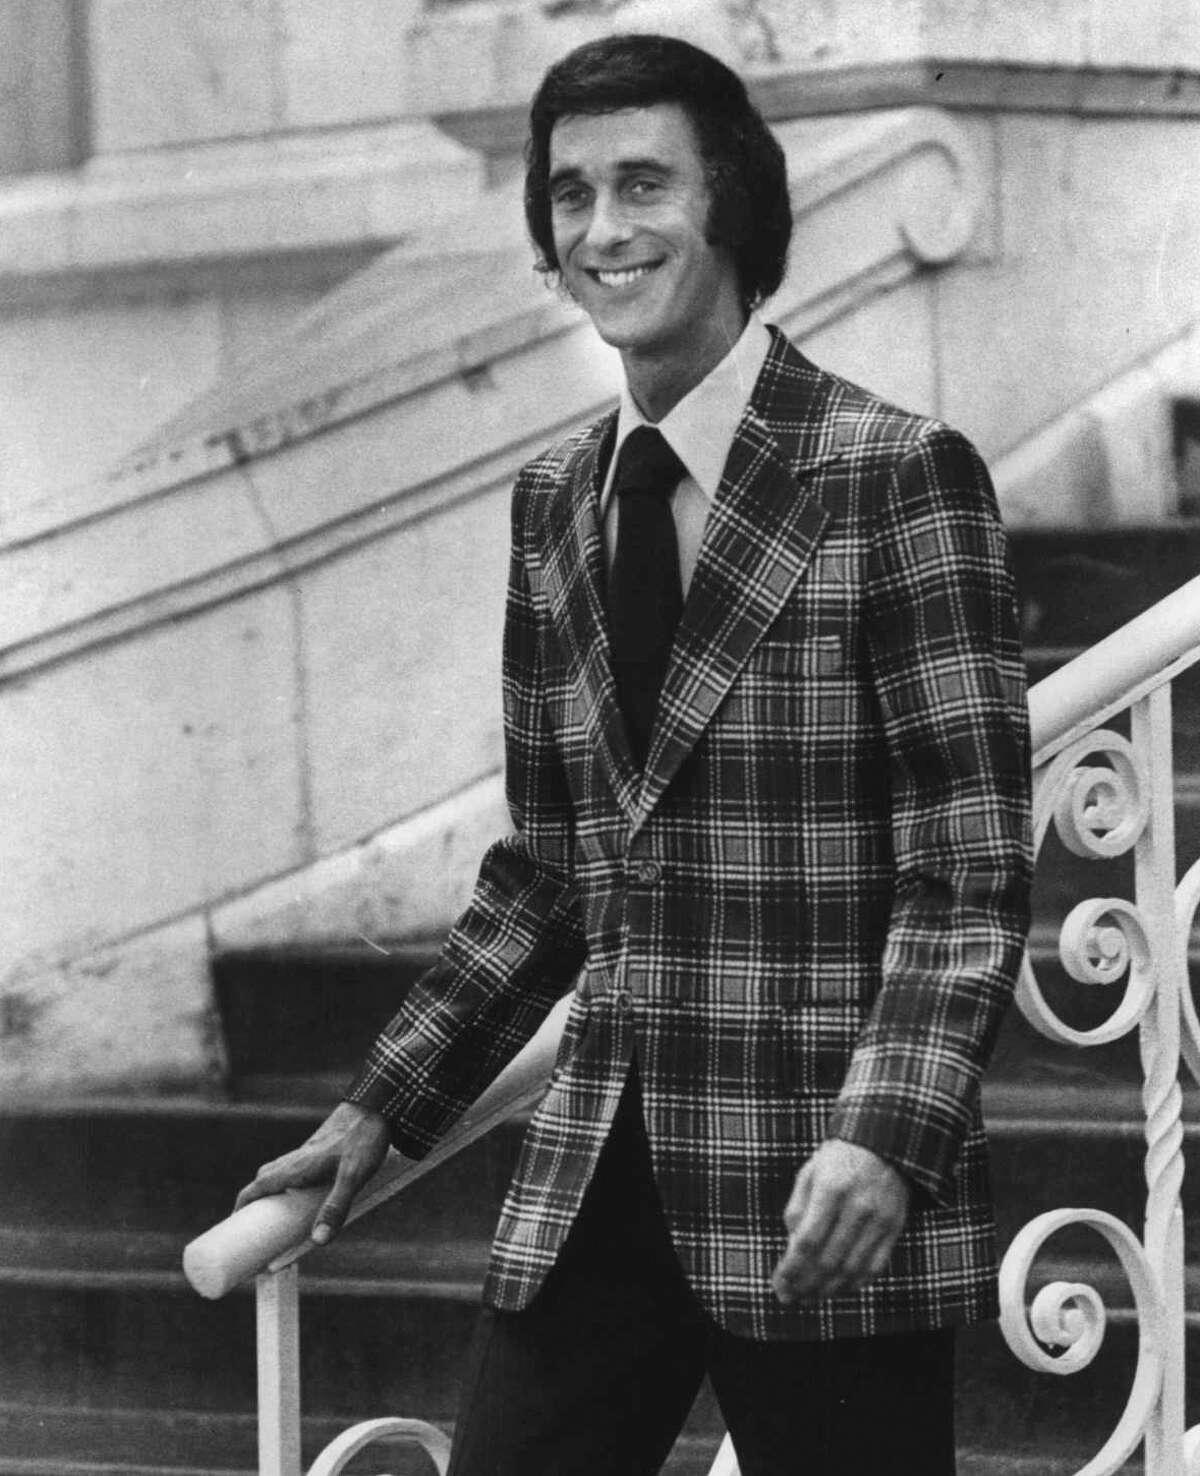 Paul Venema, courthouse reporter for KSAT Channel 12 in 1983.